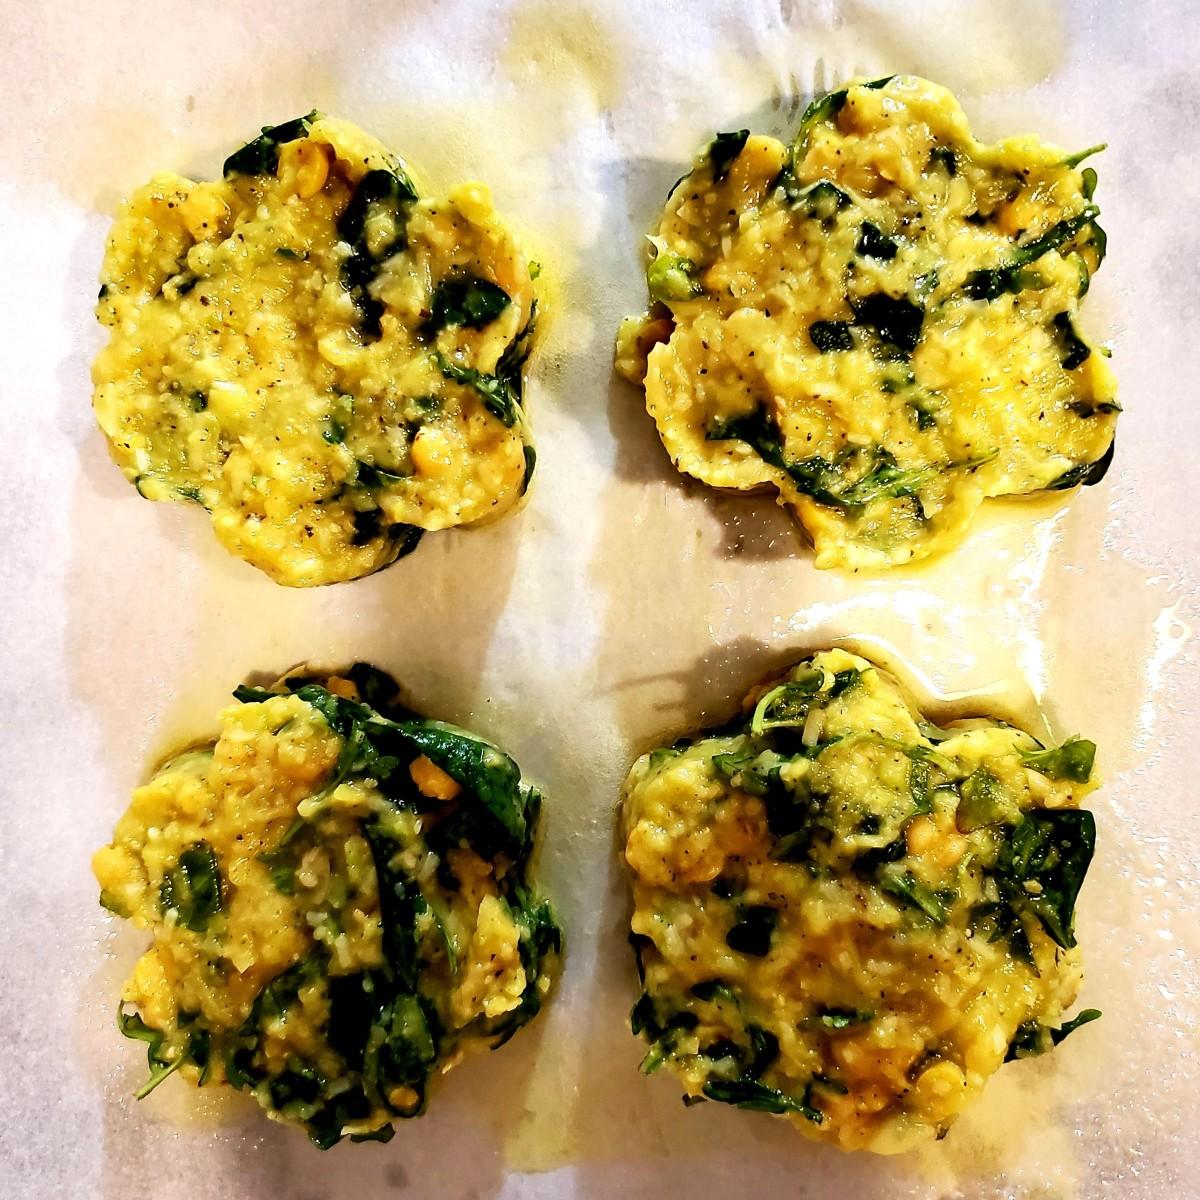 Make four patty-shaped buns.